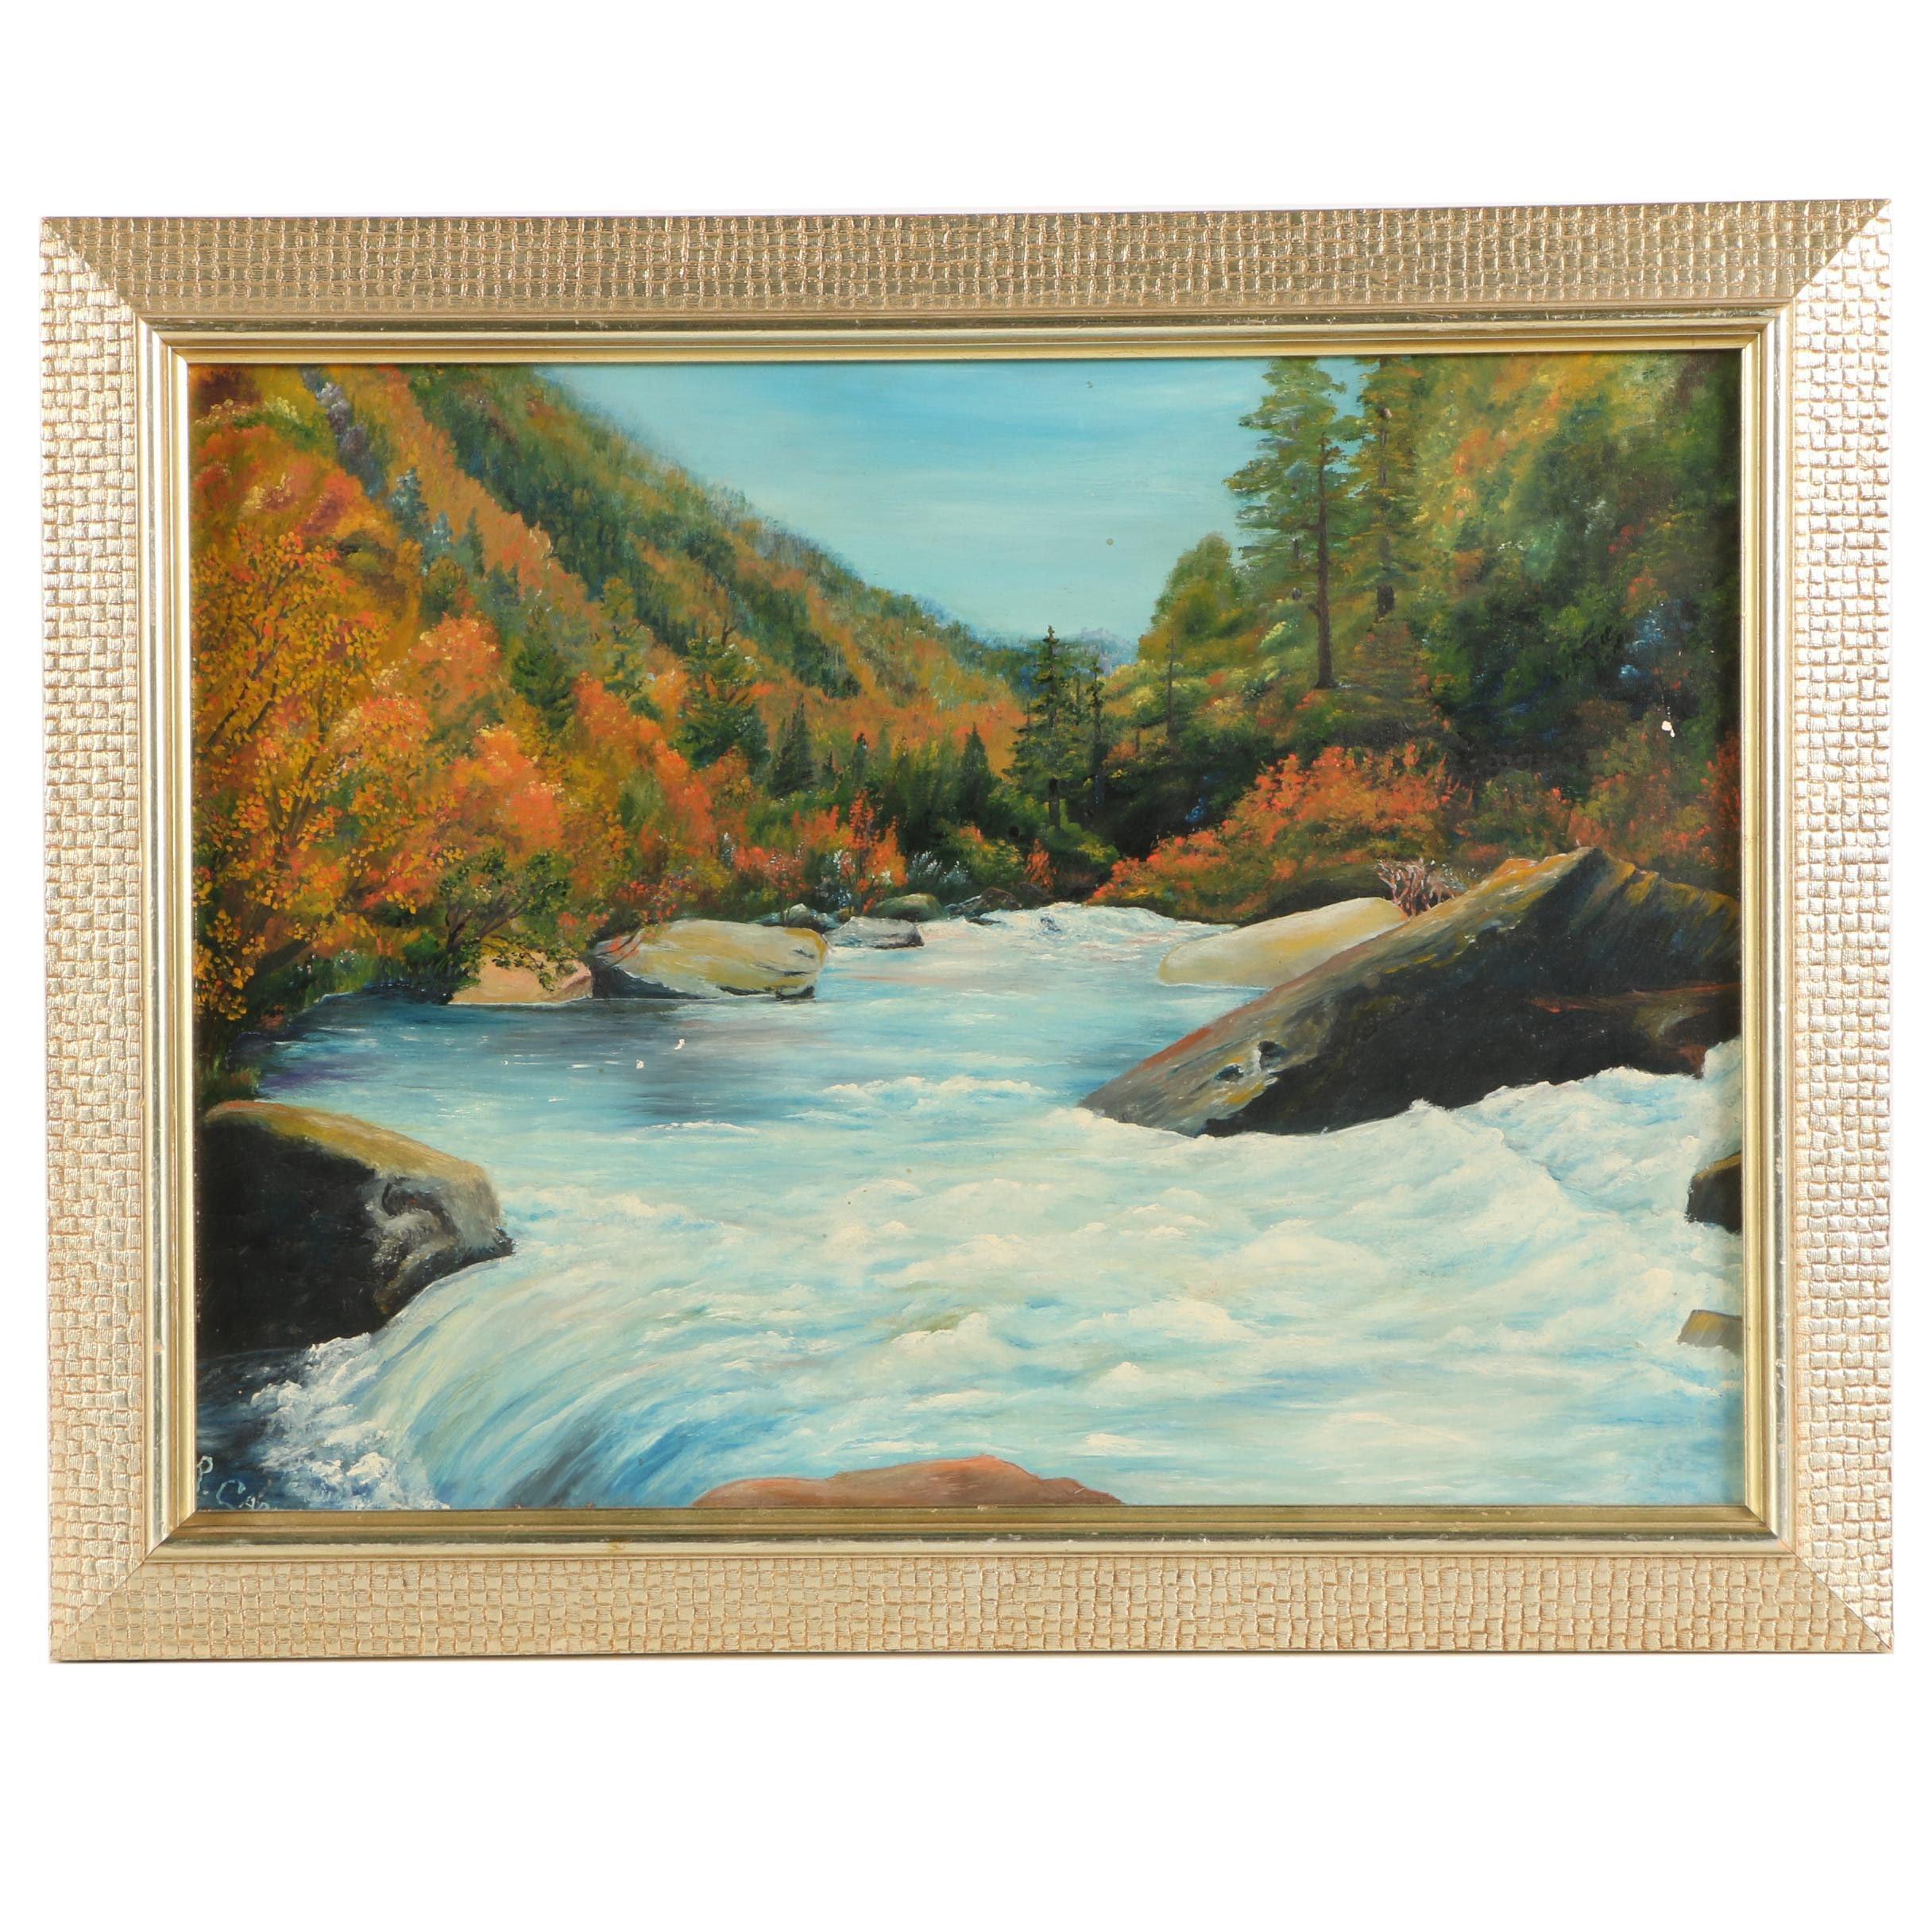 Landscape Oil Painting on Board